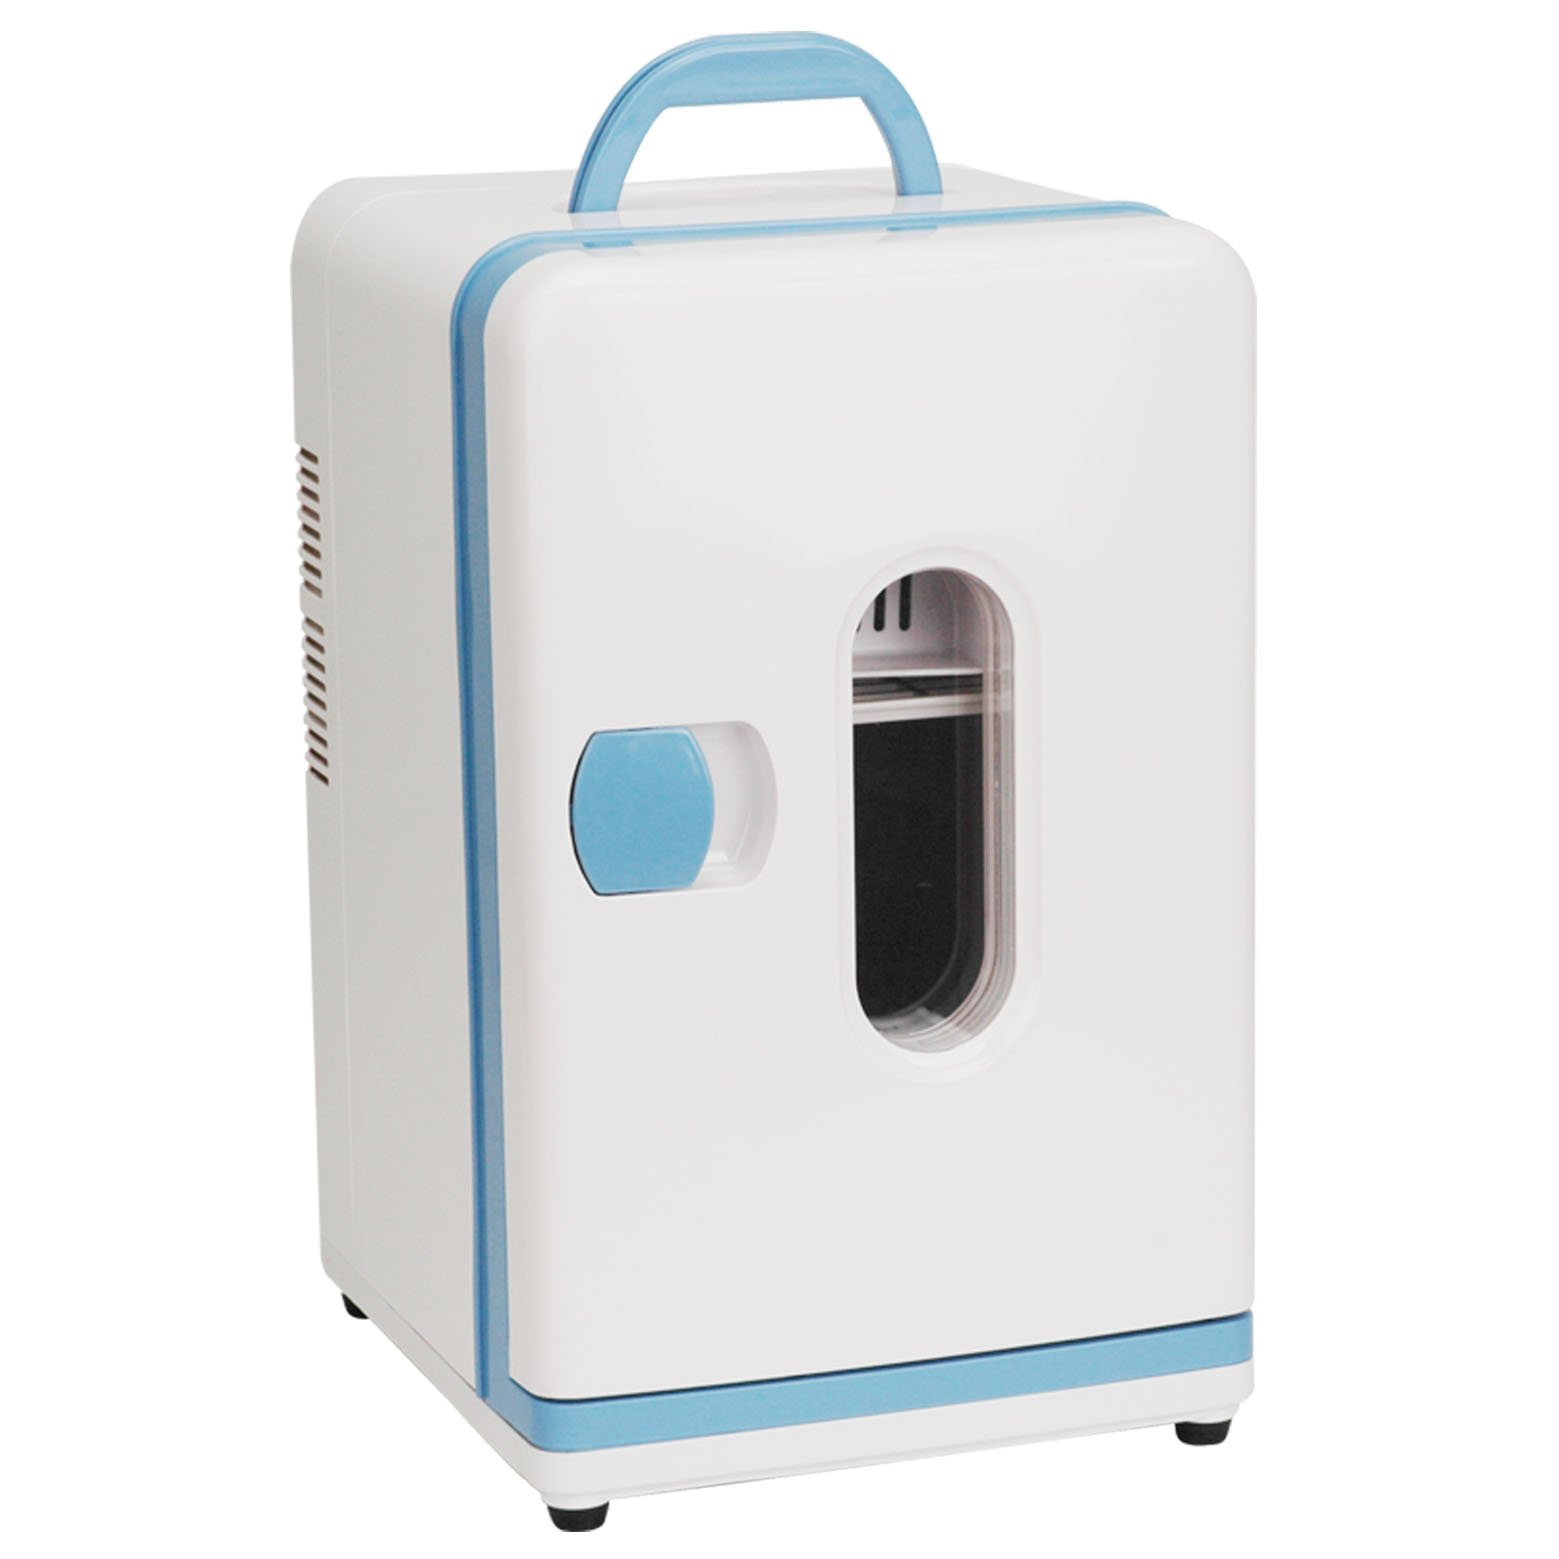 sell chest freezer car use frigerator mini freigerator car